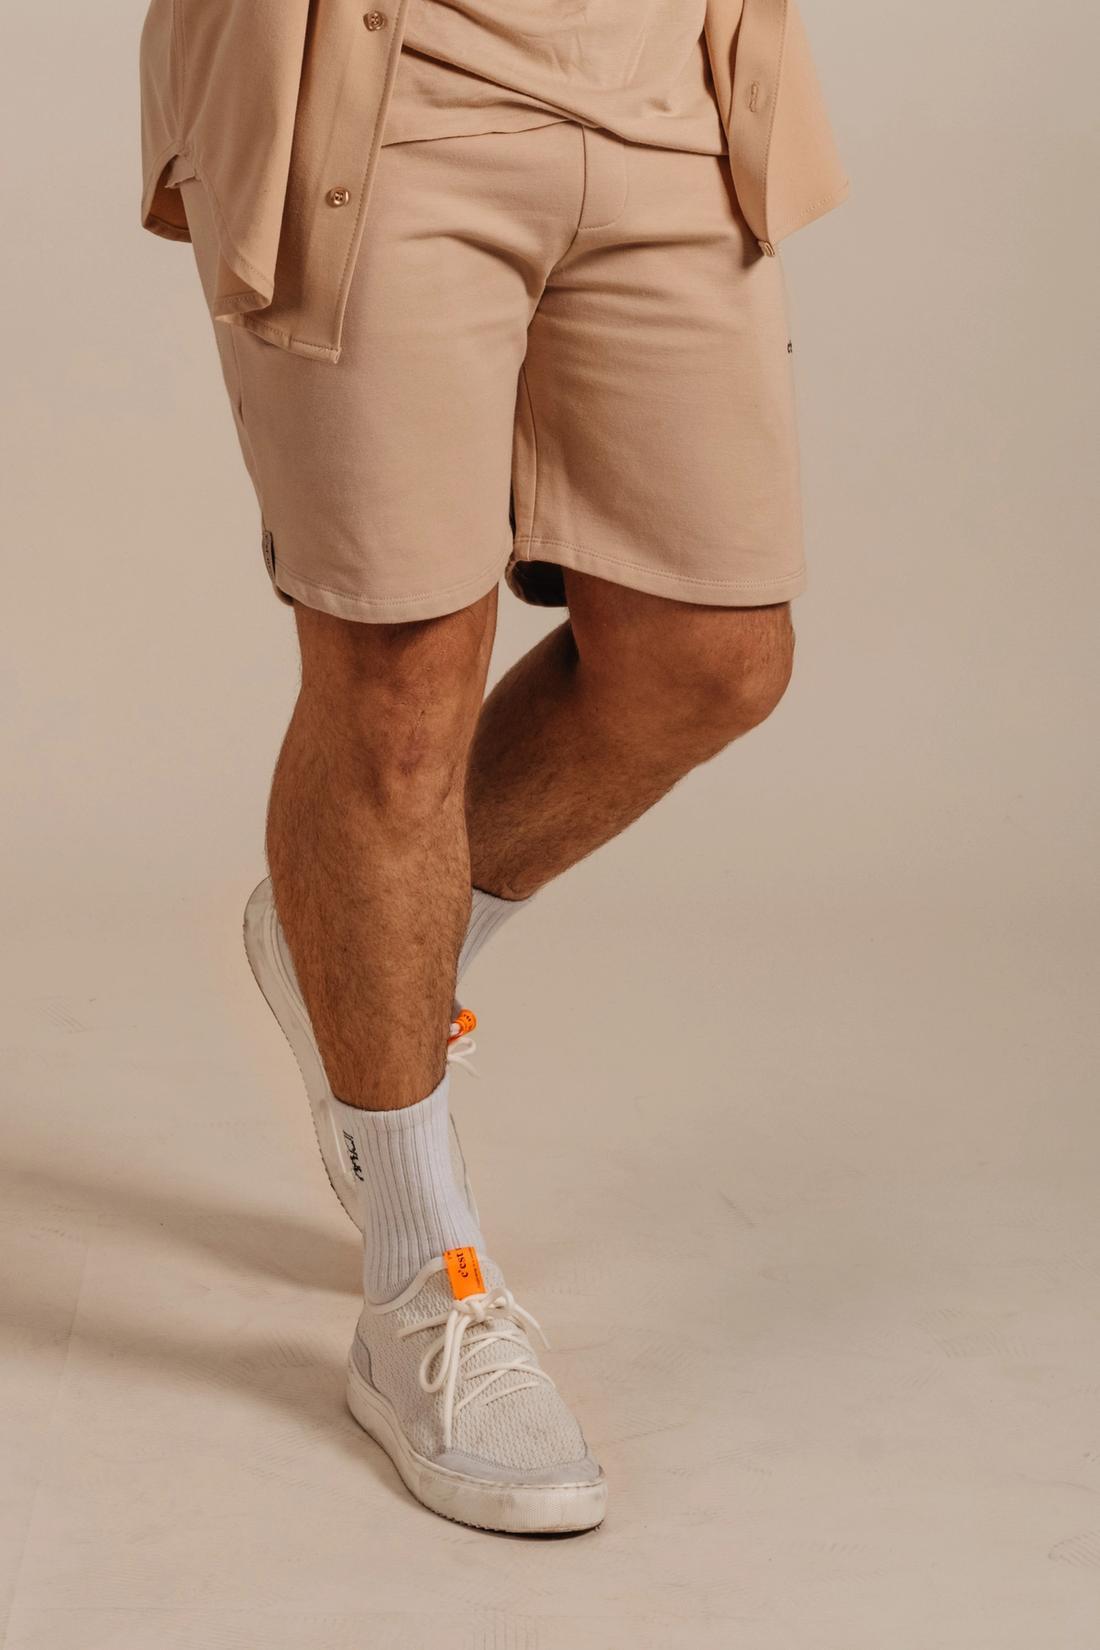 The Sweat Shorts